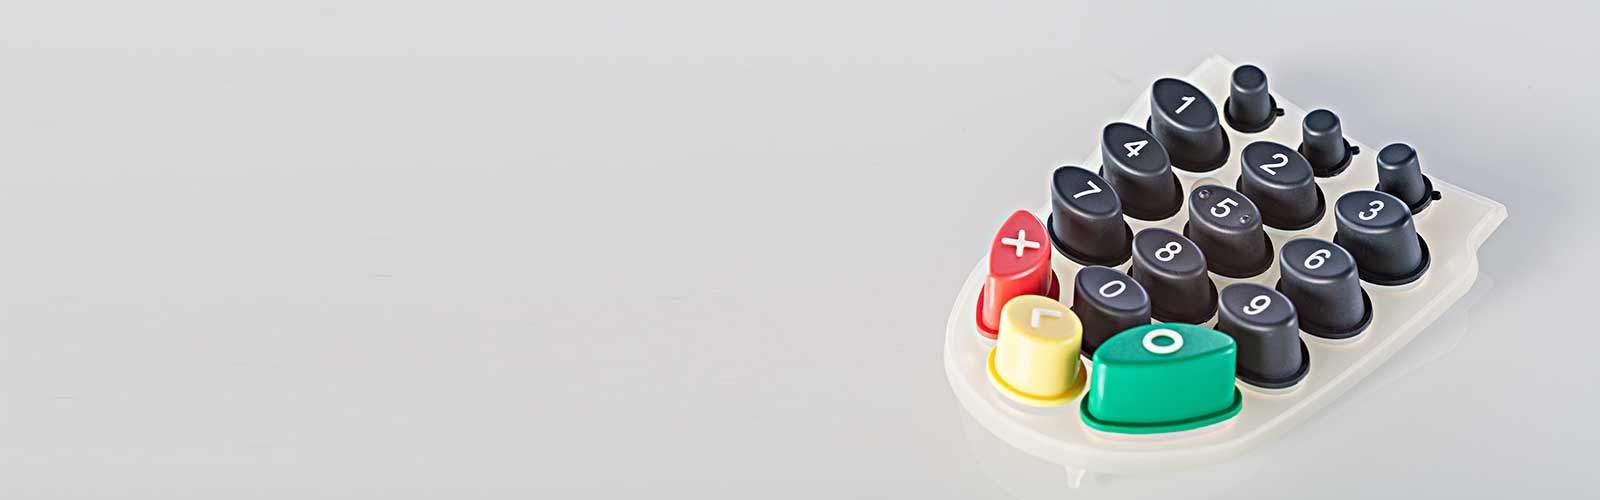 Silikontastatur Ziffernblock mehrfarbig von mentec®